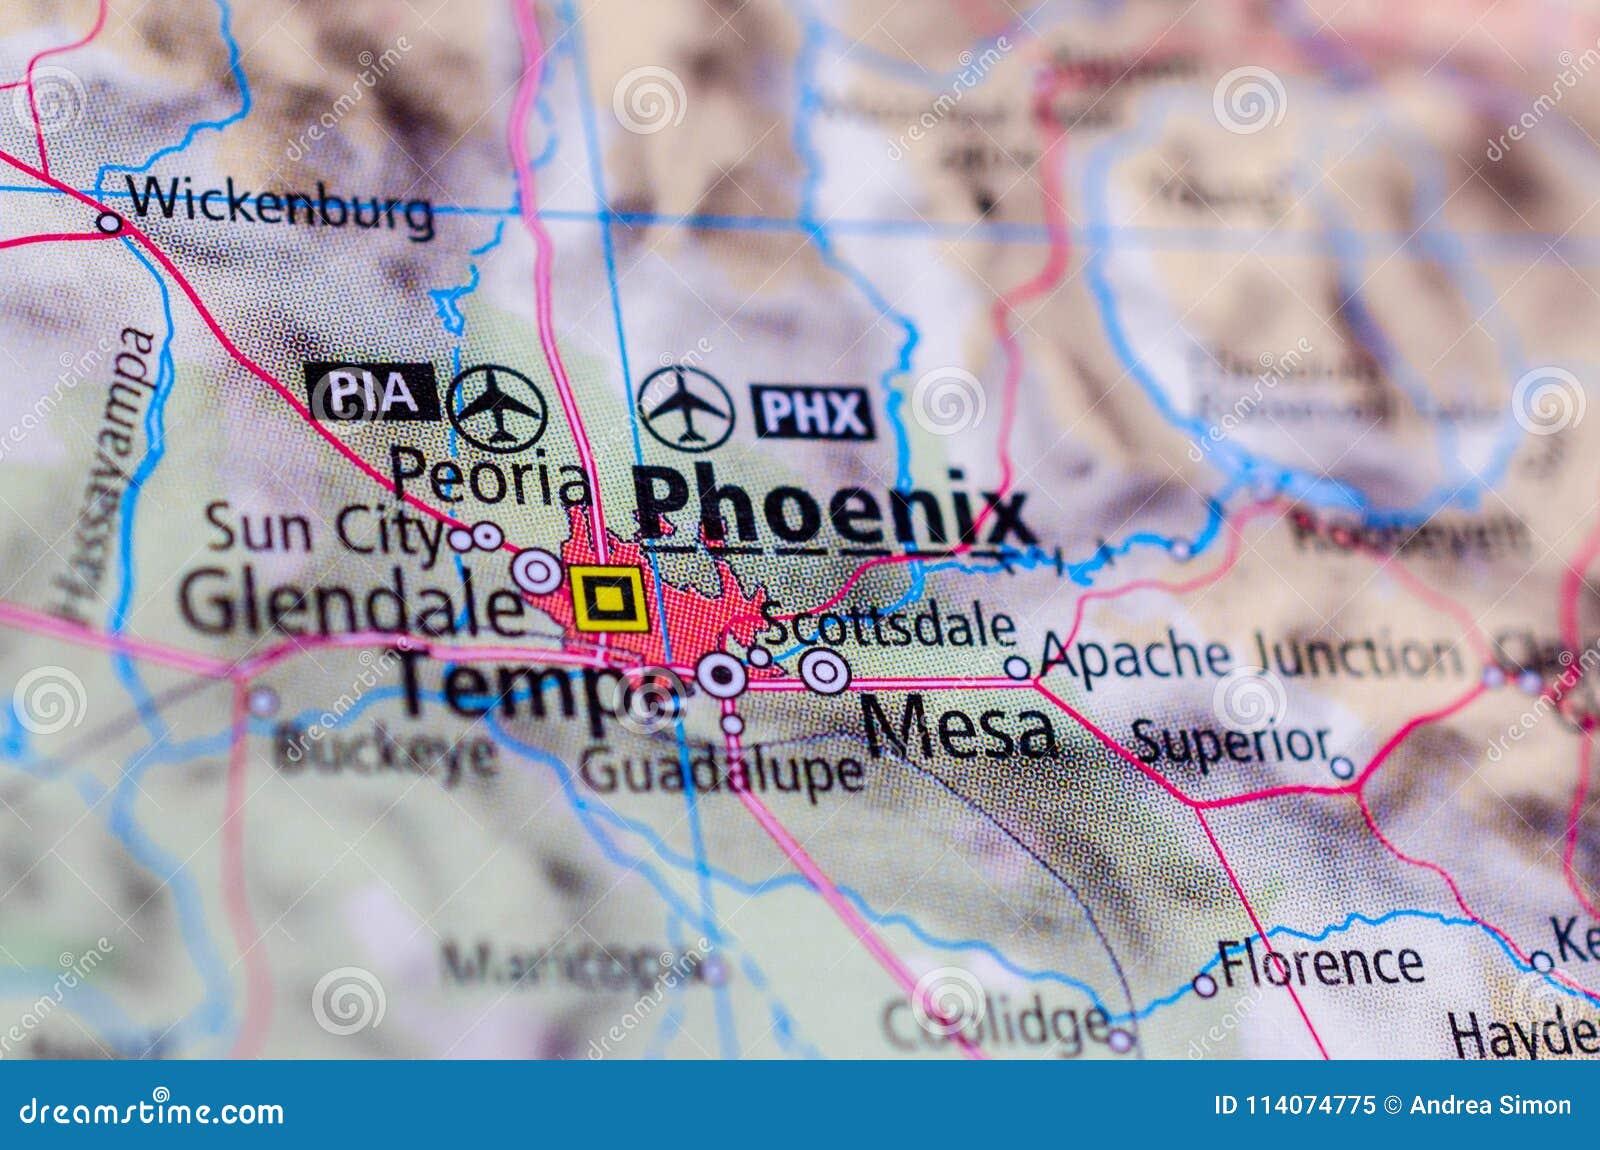 Phoenix, Arizona on map